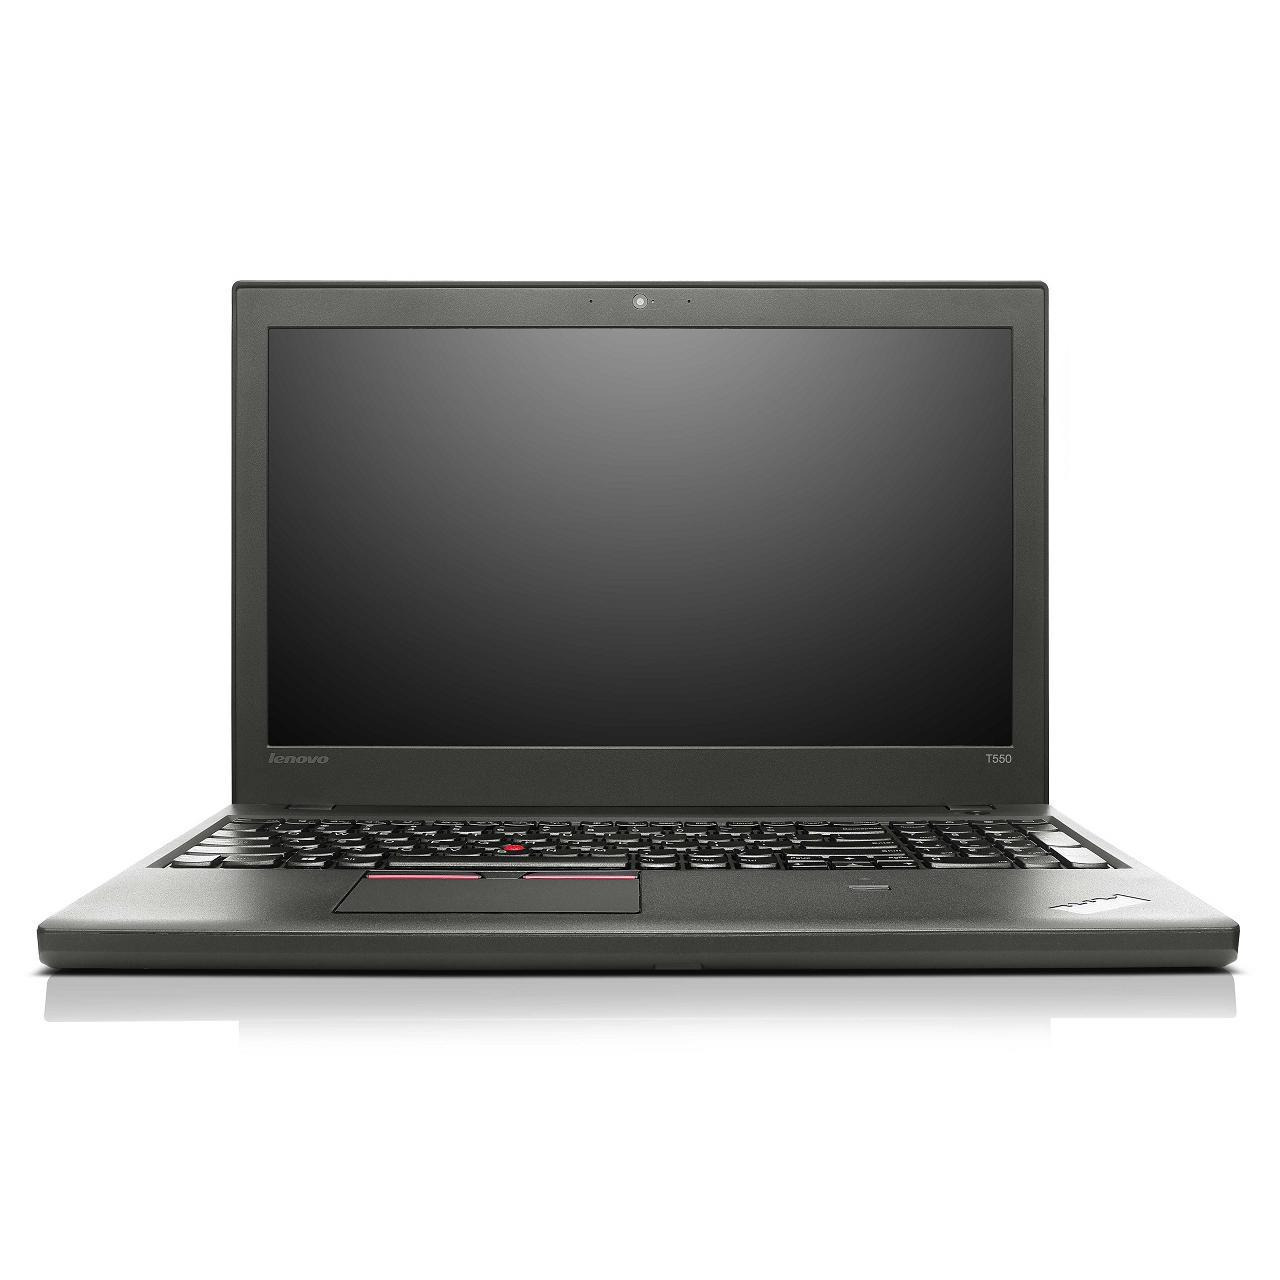 Lenovo Thinkpad T550 15-inch (2016) - Core i7-5600U - 8 GB  - SSD 256 GB